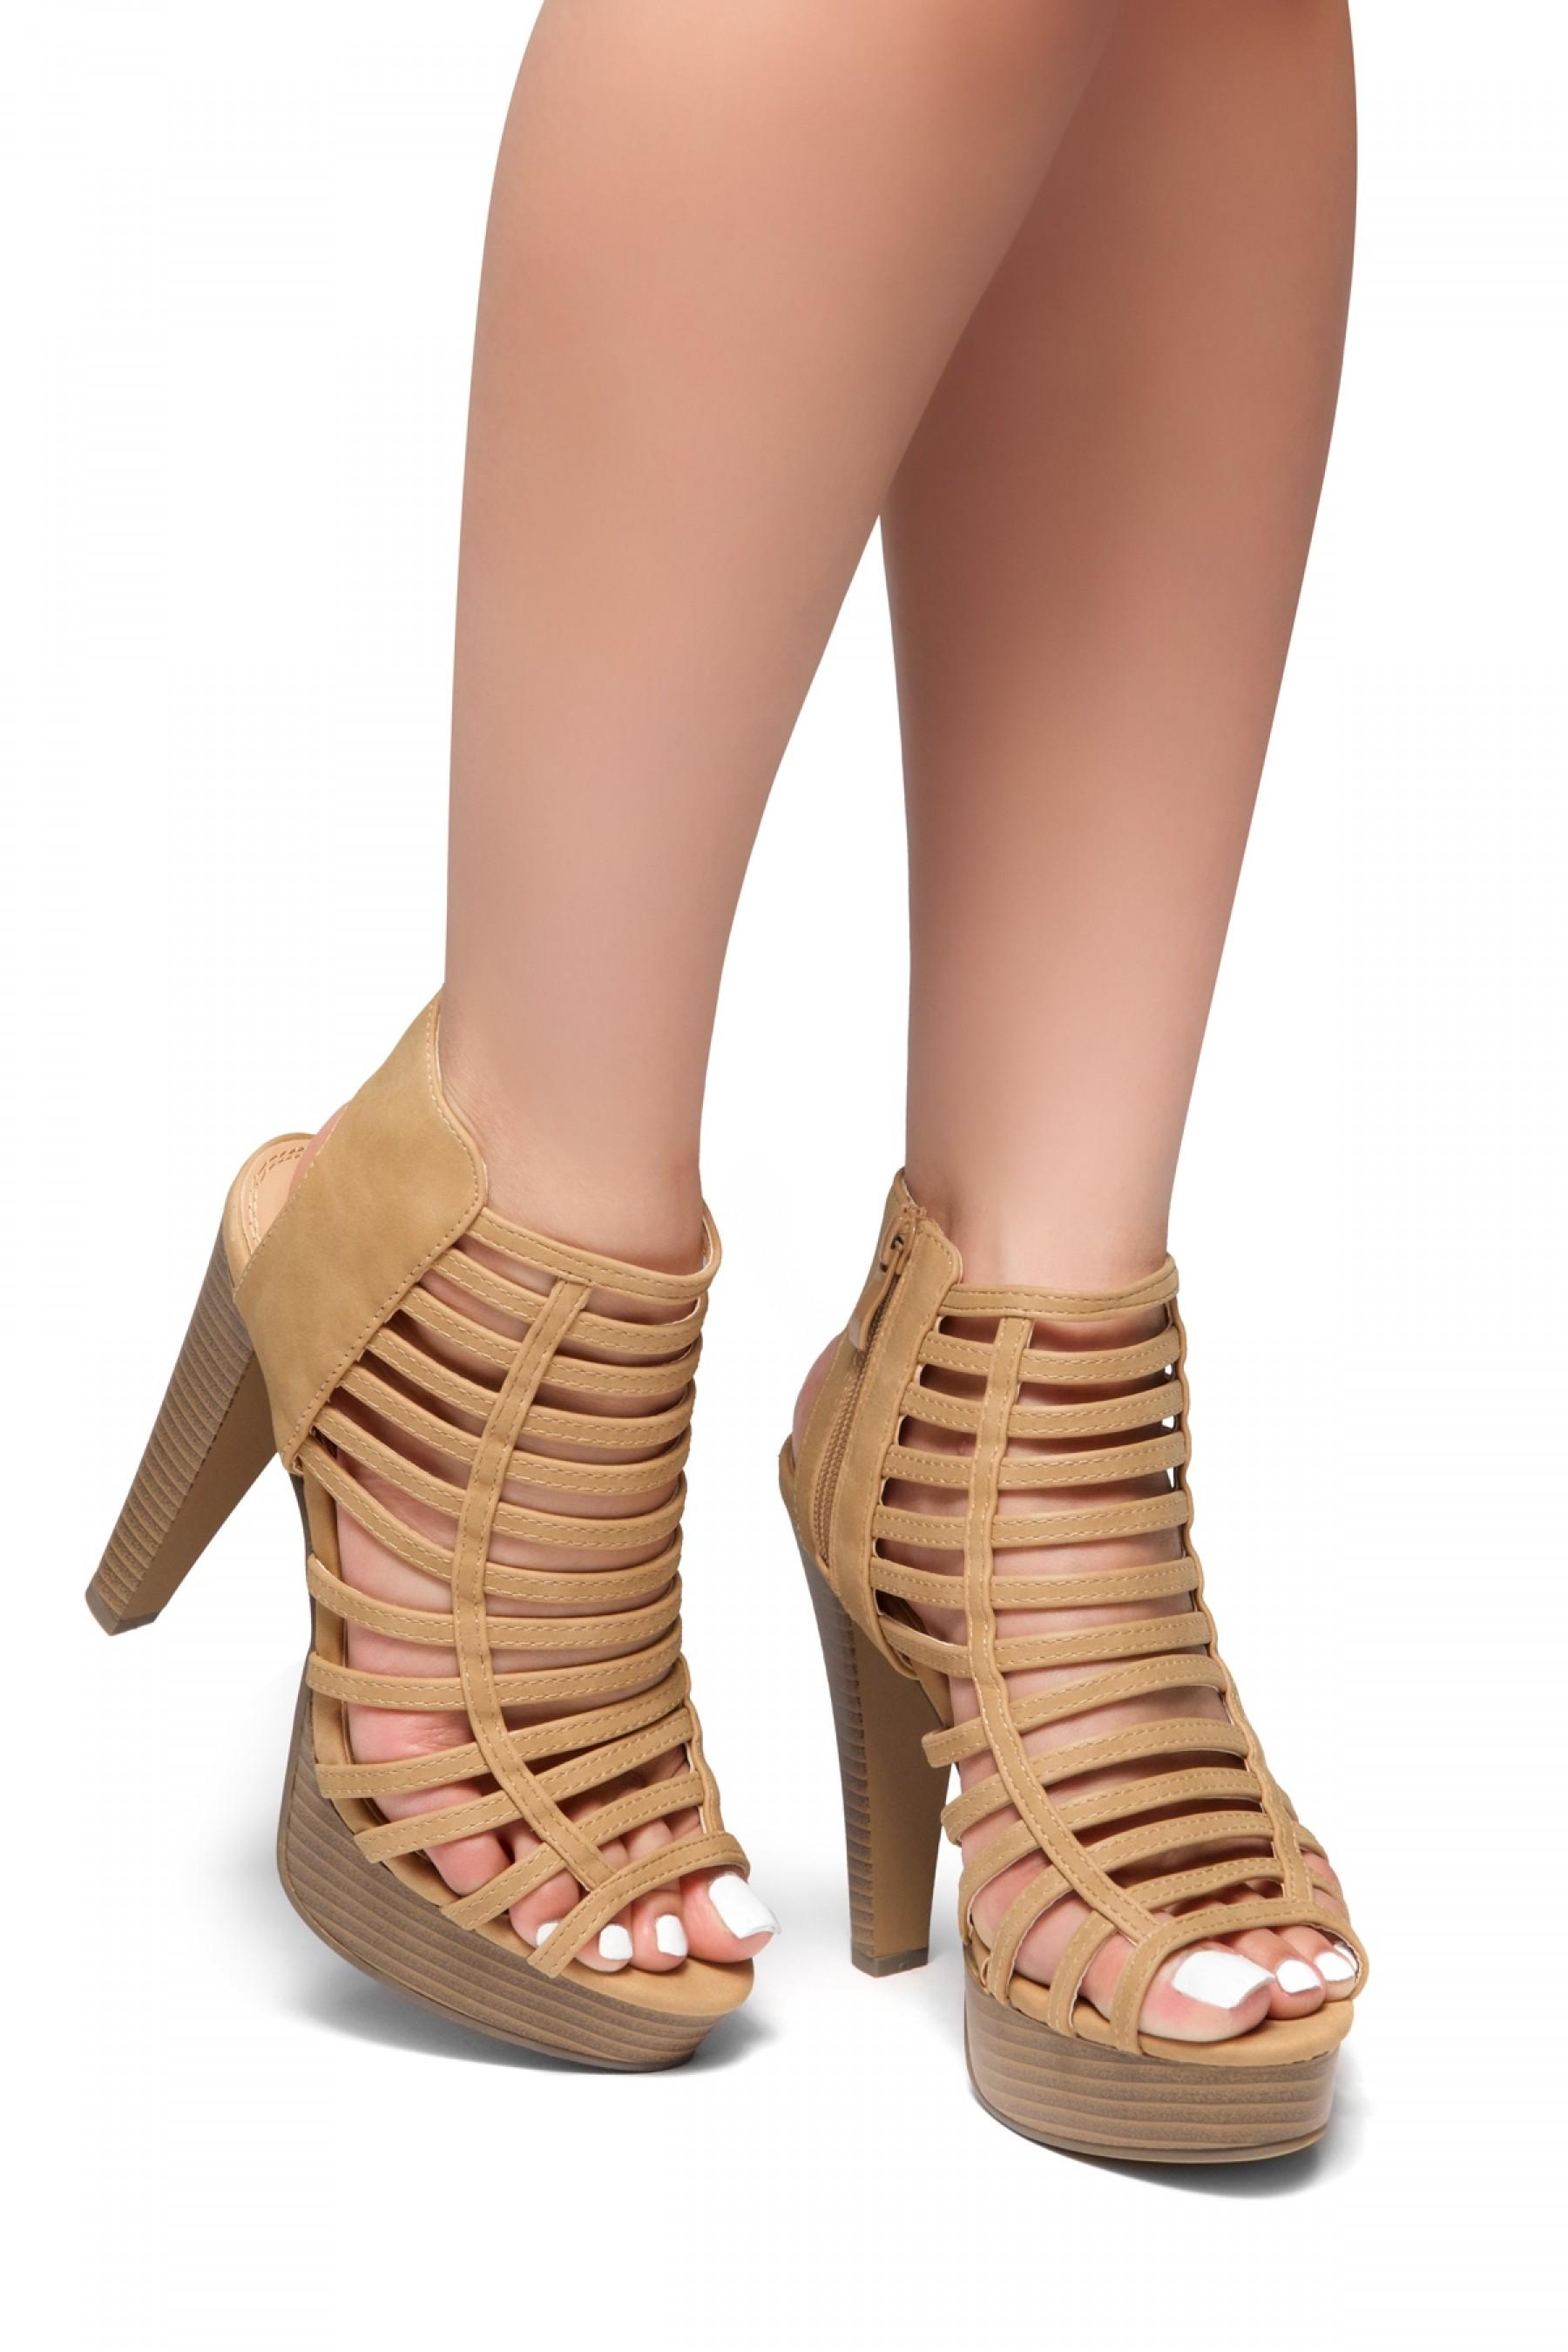 HerStyle Elevate Me-Peep Toe Chunky Platform Heel (Nude)